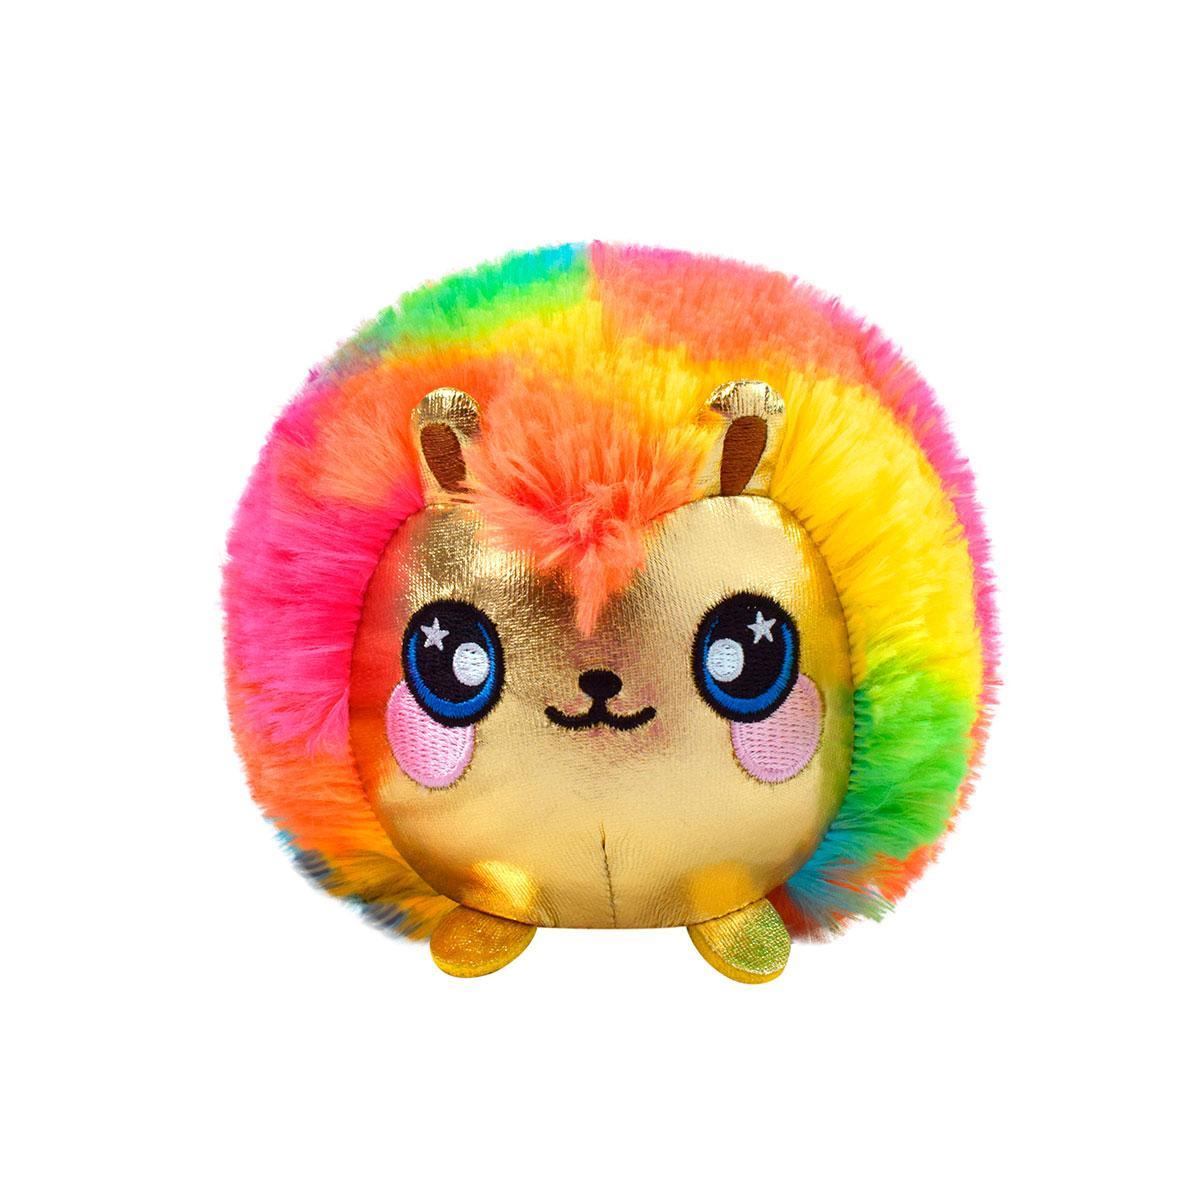 Ароматна М'яка Іграшка Squeezamals S3 - Їжачок Панки